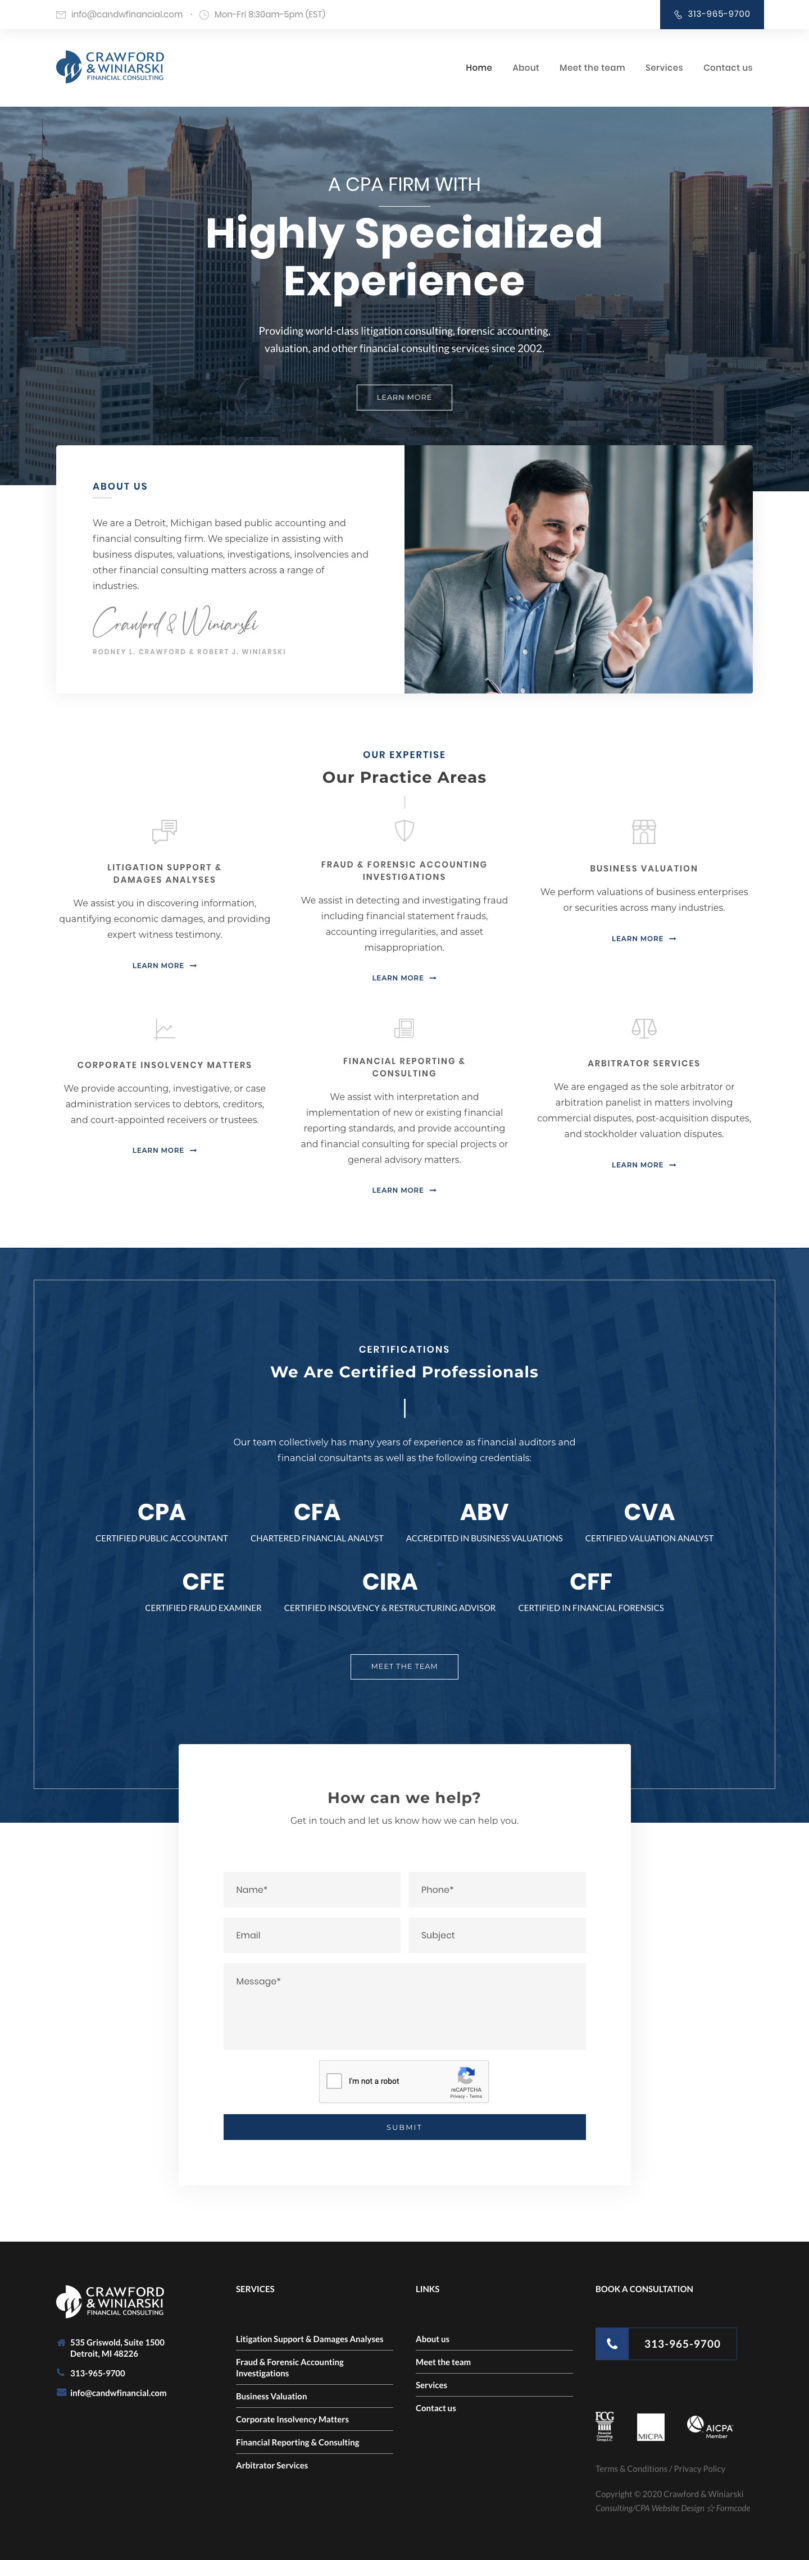 Financial Services Web Design - lead gen web design